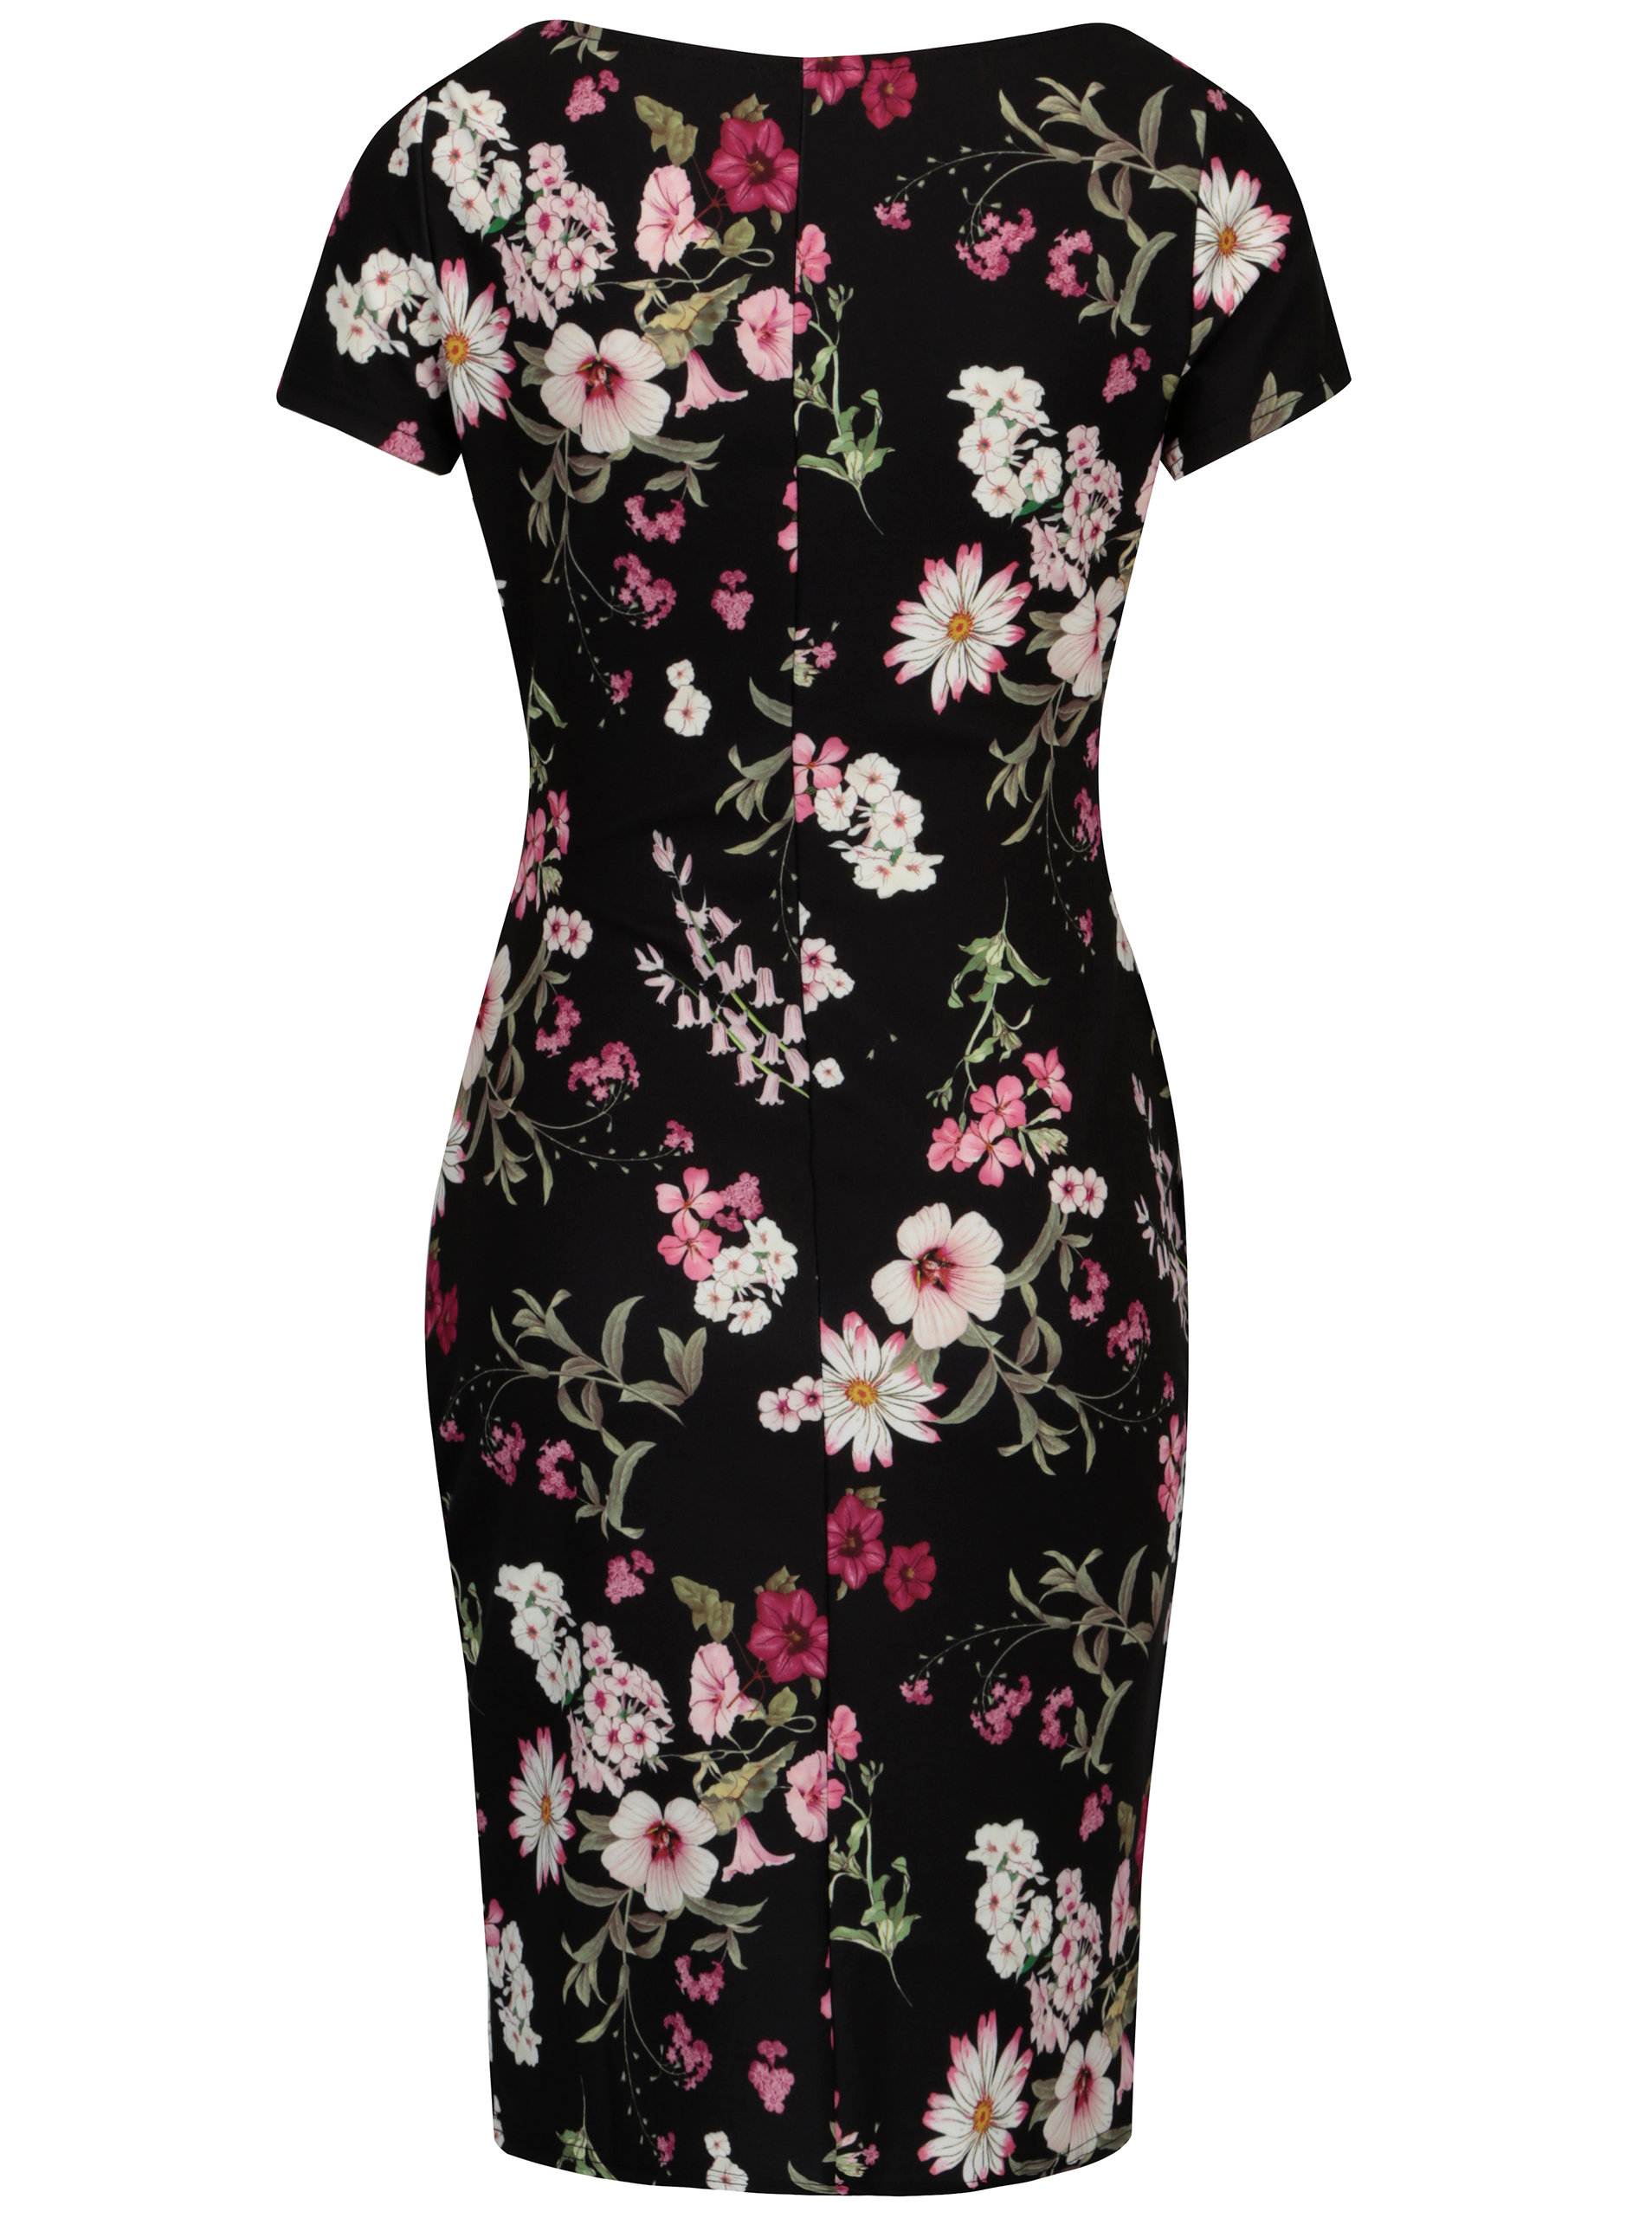 Růžovo-černé květované šaty s krátkým rukávem Dorothy Perkins ... 6631a5aea8